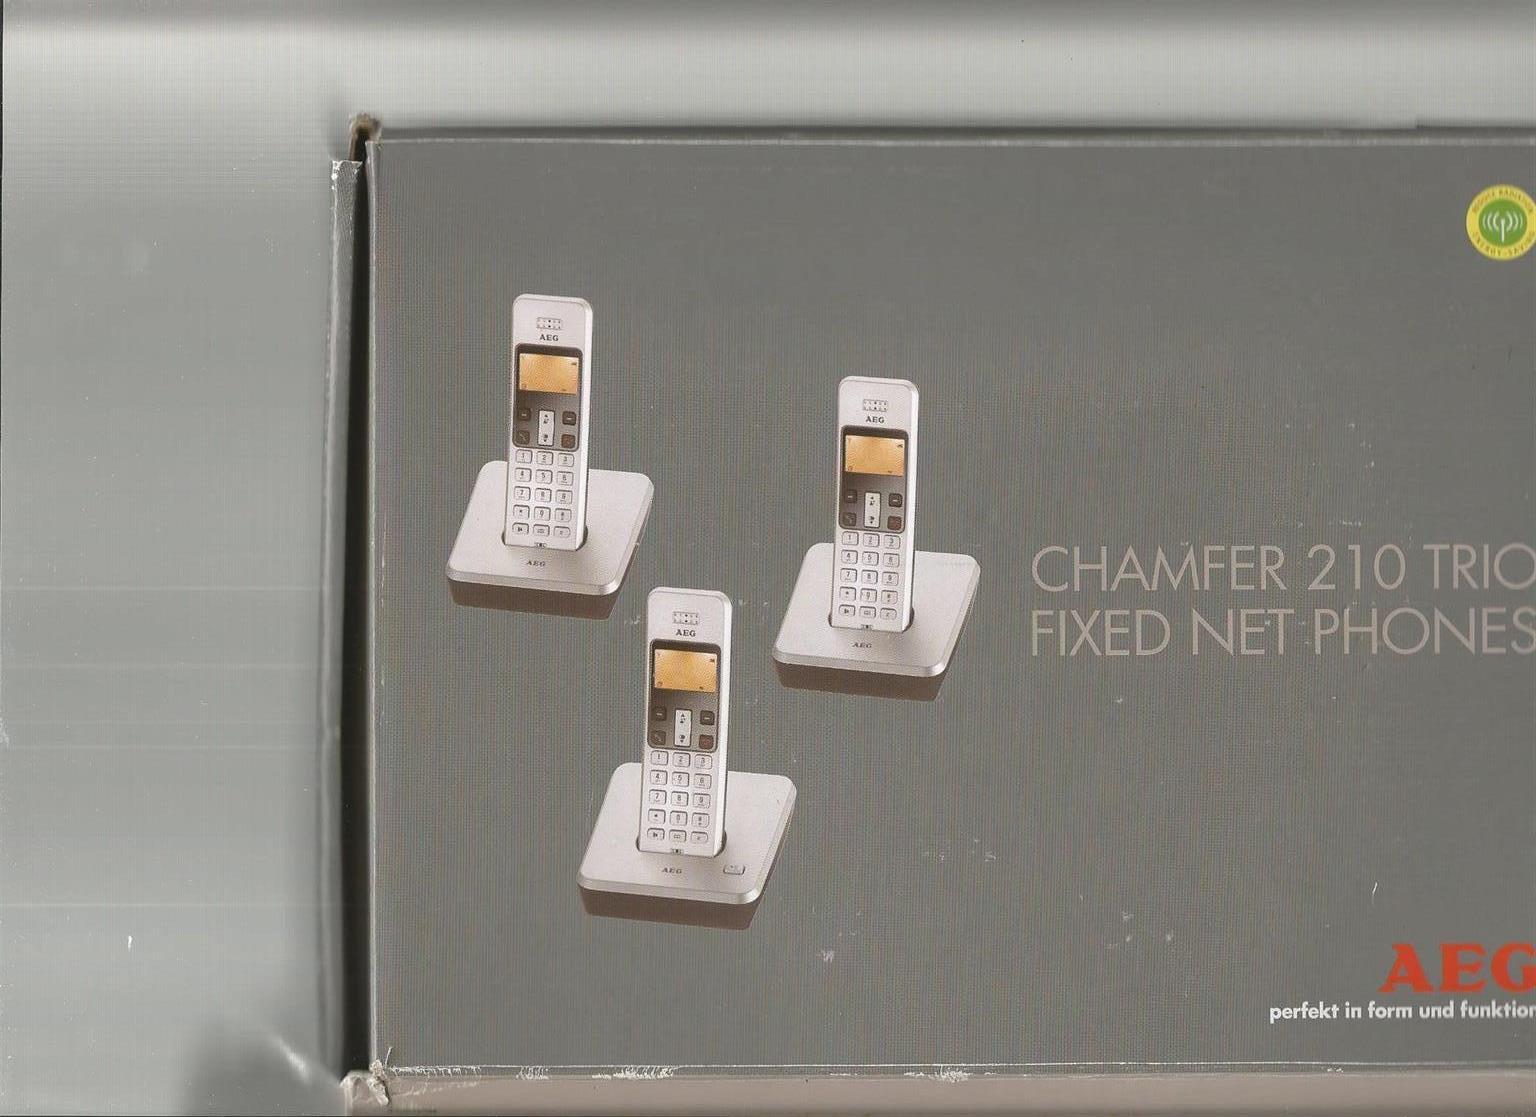 AEG CHAMFER 210 TRIO PHONES